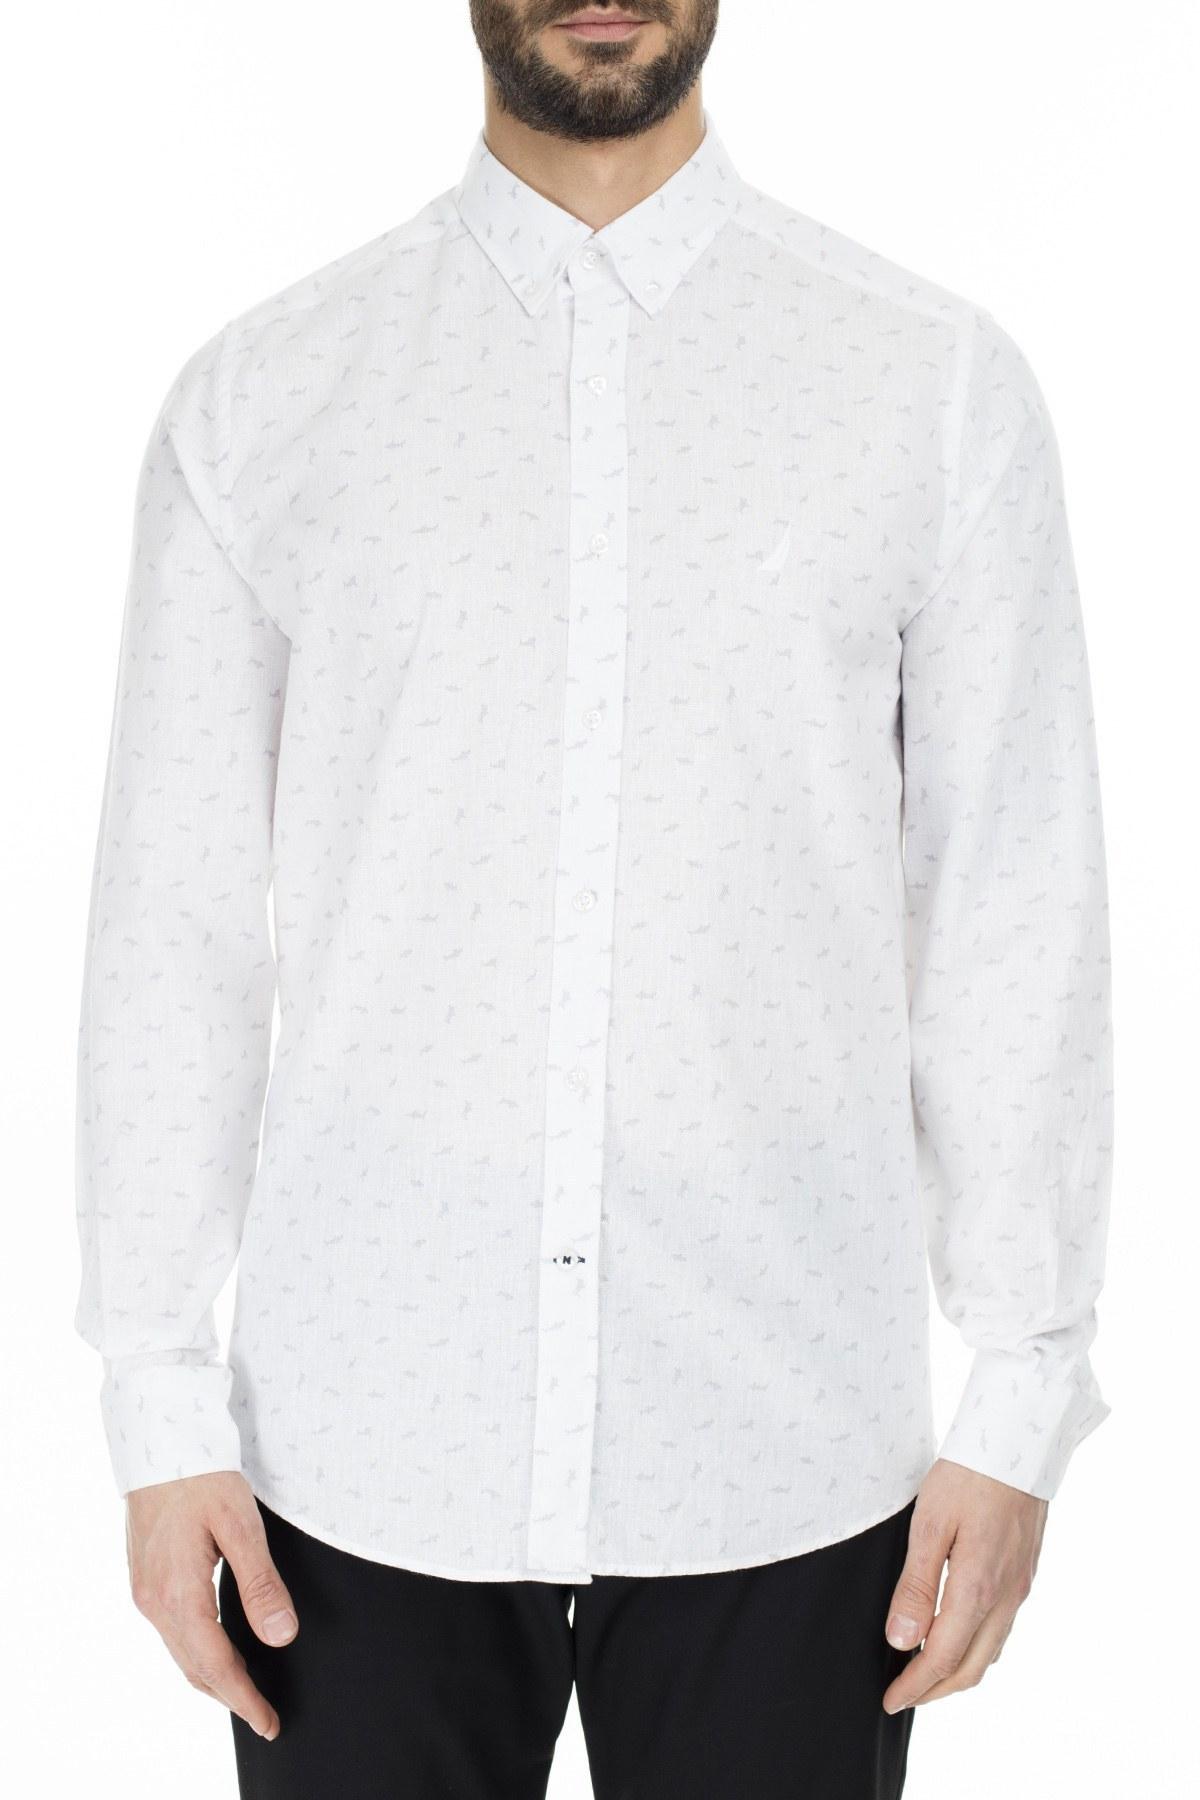 Nautica Slim Fit Erkek Gömlek WR0140T 1BW BEYAZ